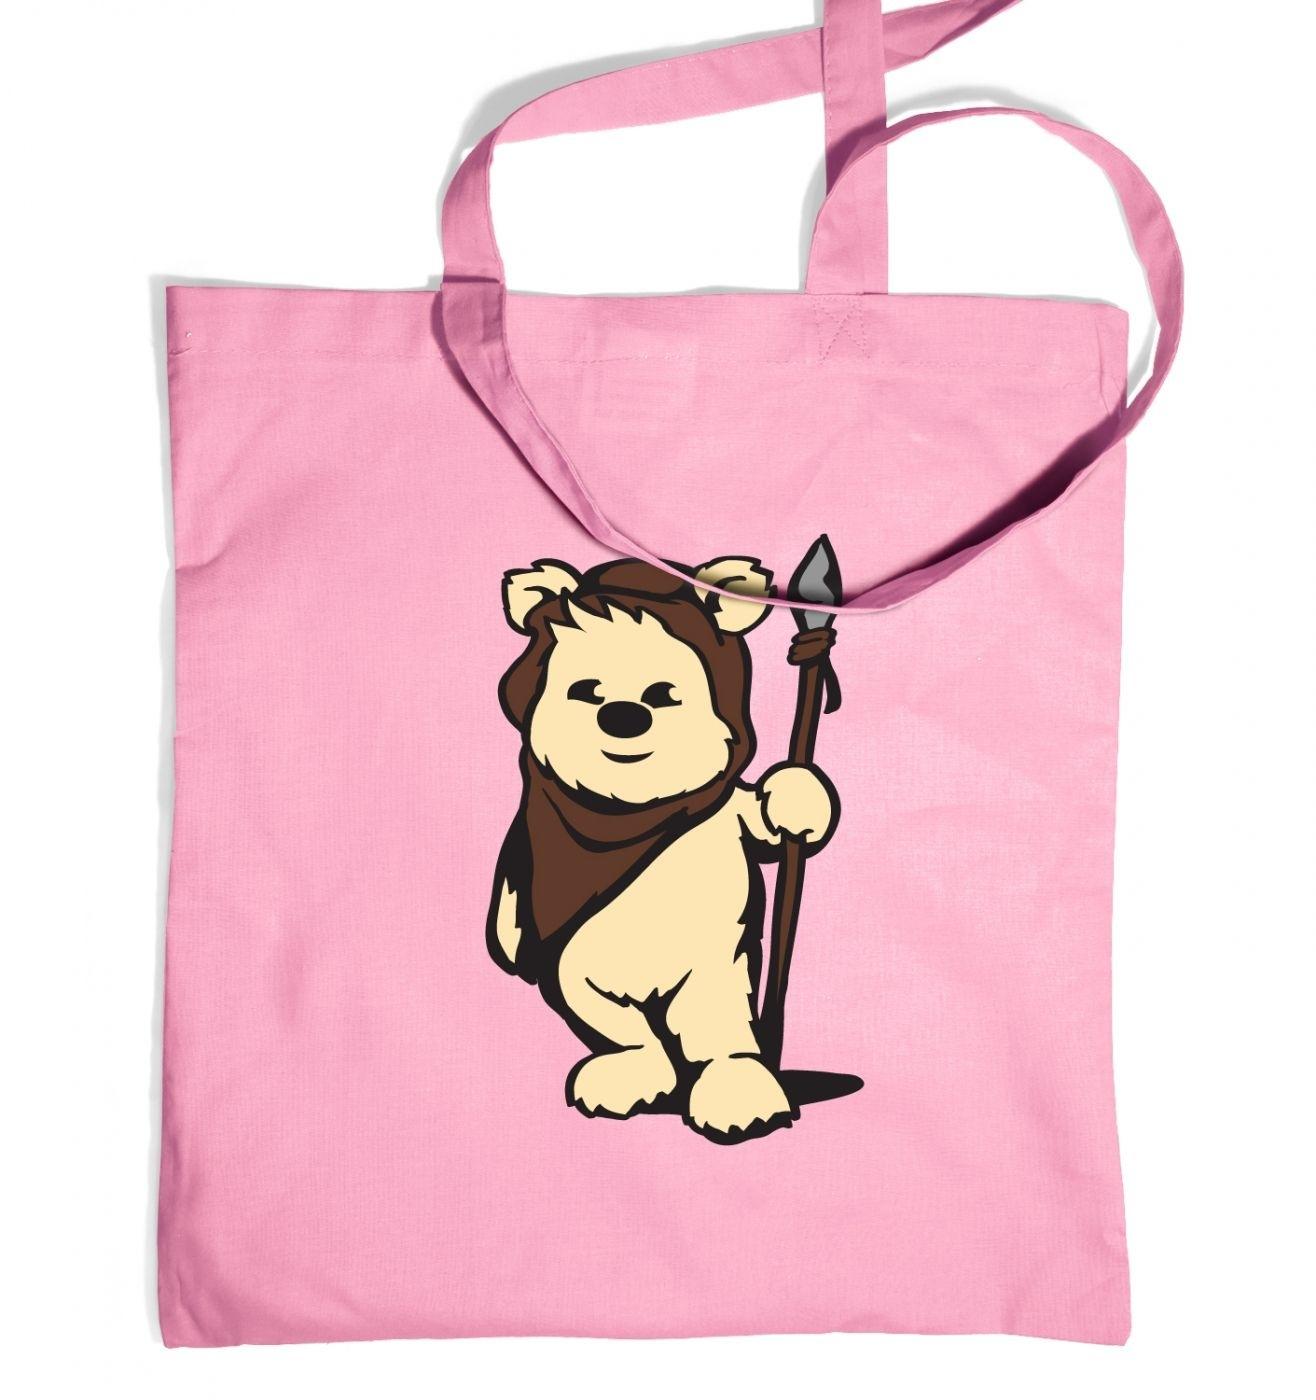 Cute Ewok tote bag